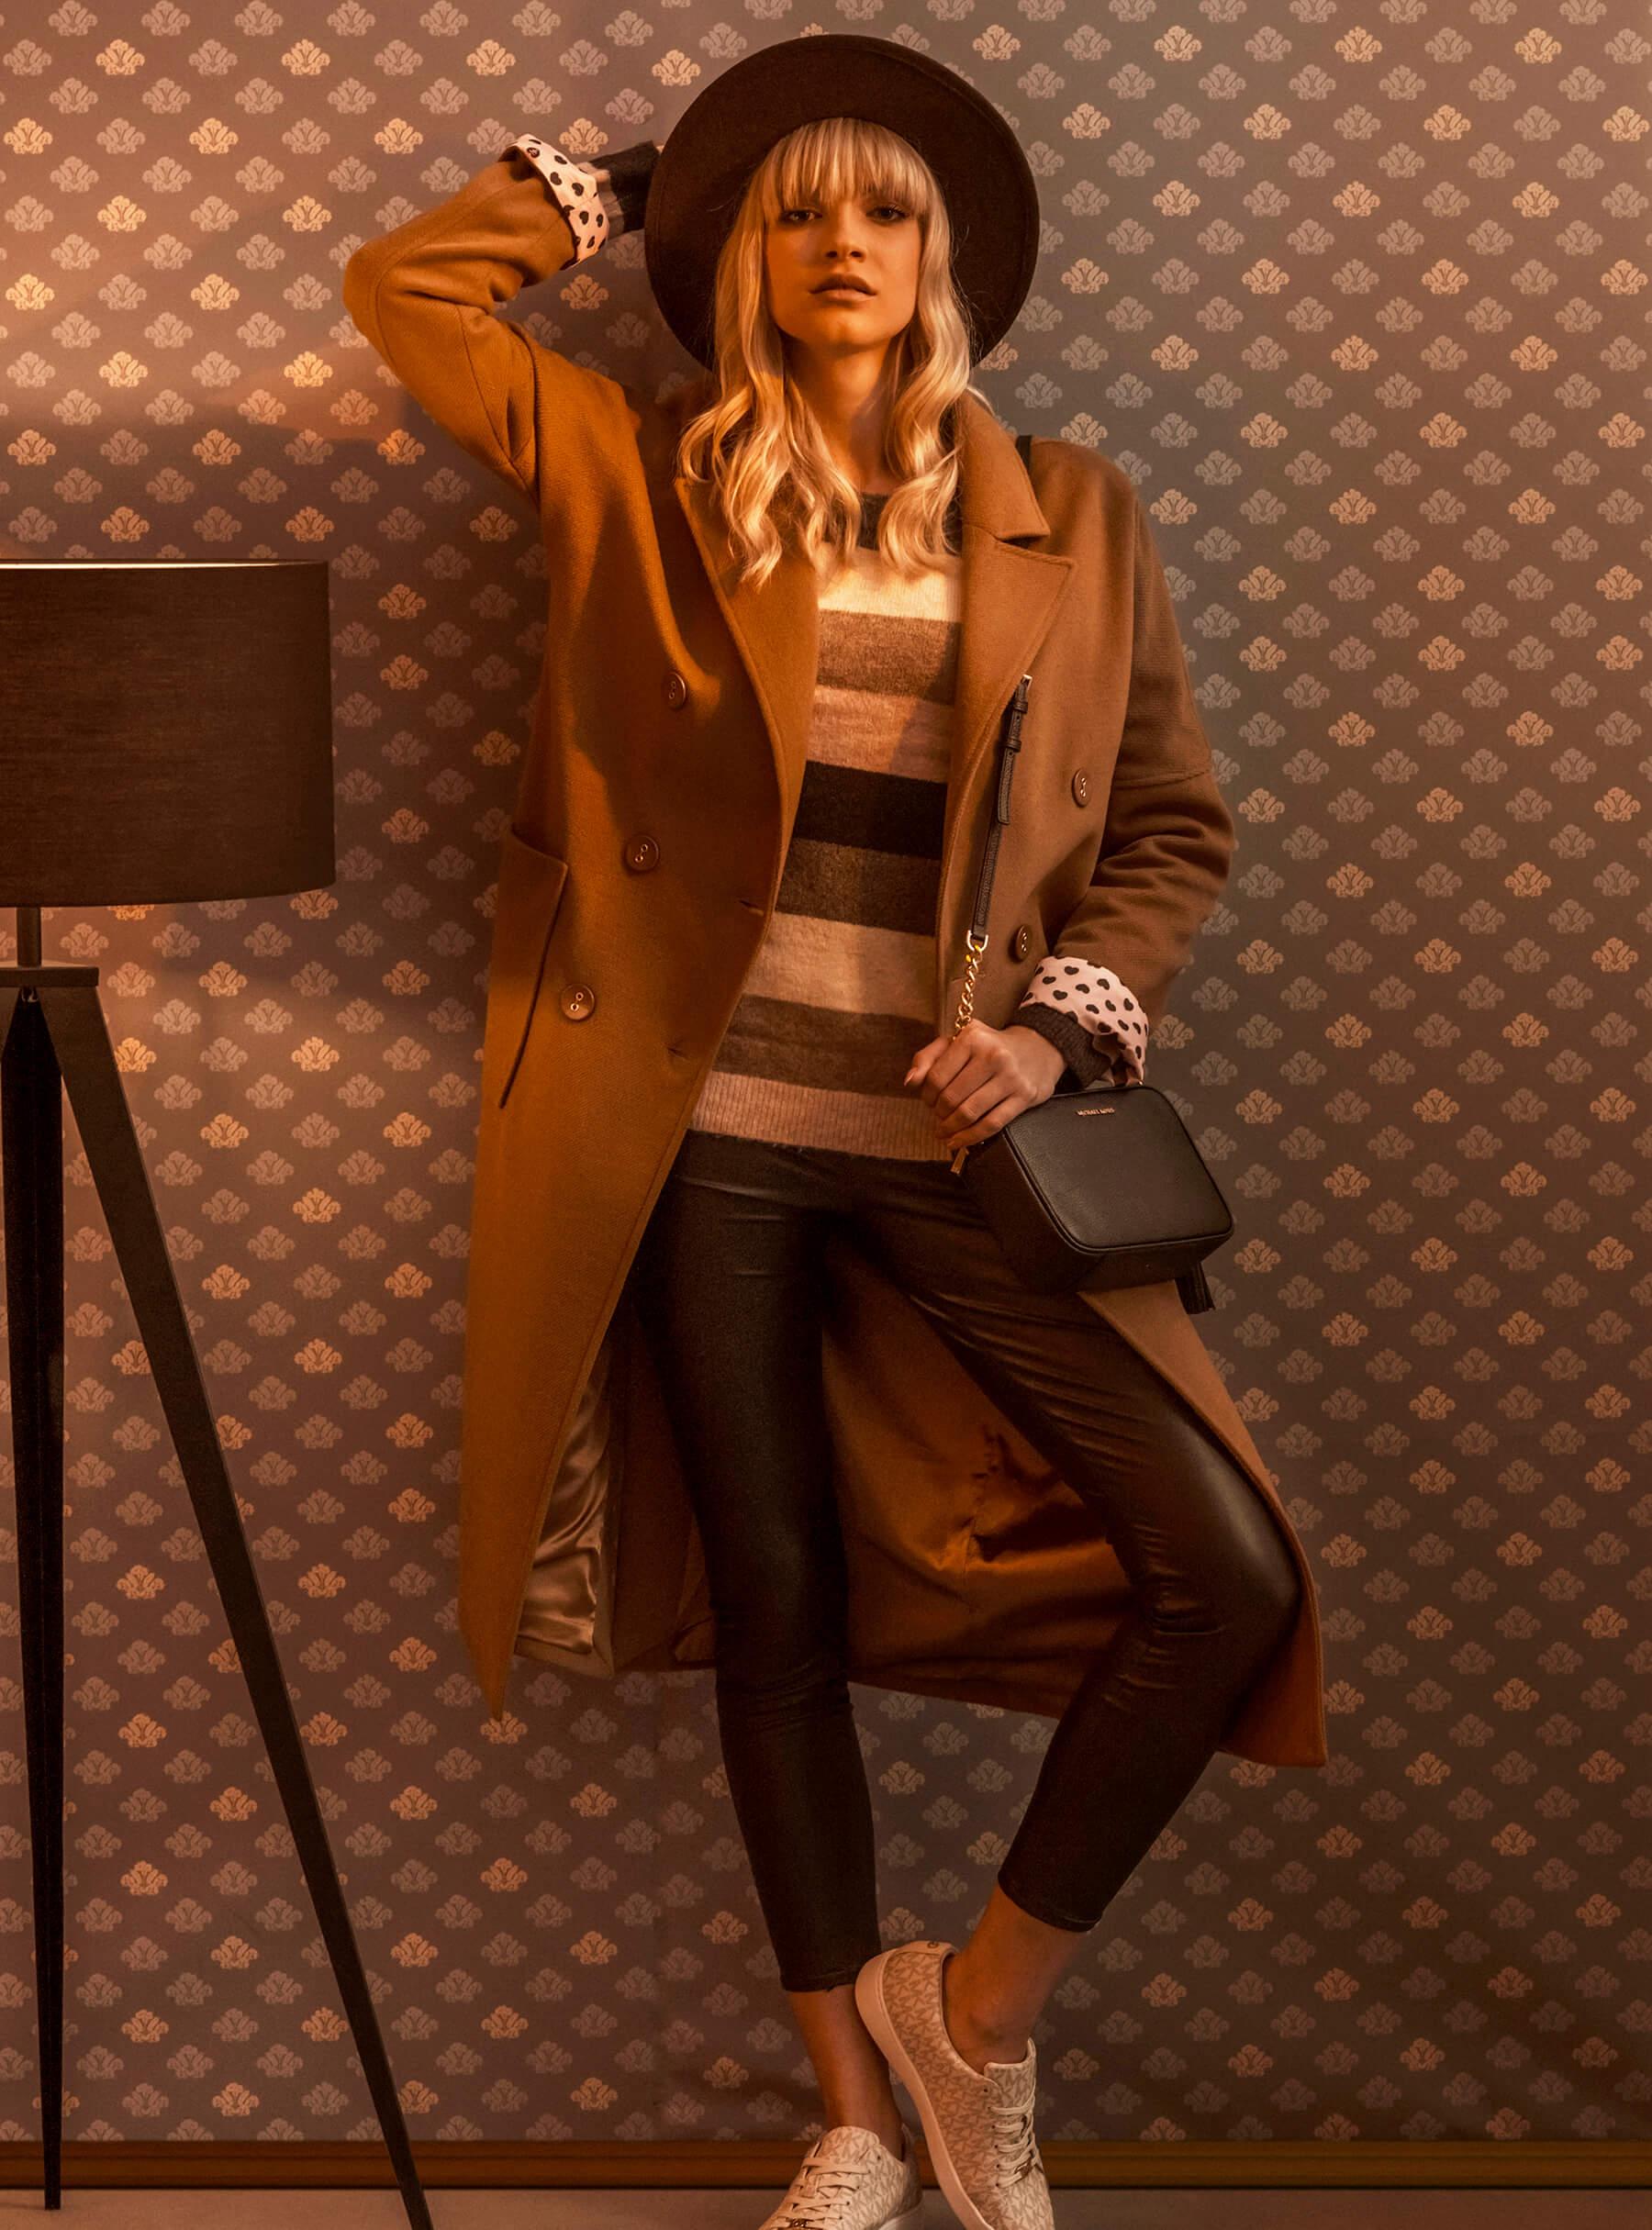 Parfois klobuk 27,99 € Fracomina plašč 239 € Vero Moda pulover 26,99 € Only pajkice 29,99 € Michael Kors superge 140 €